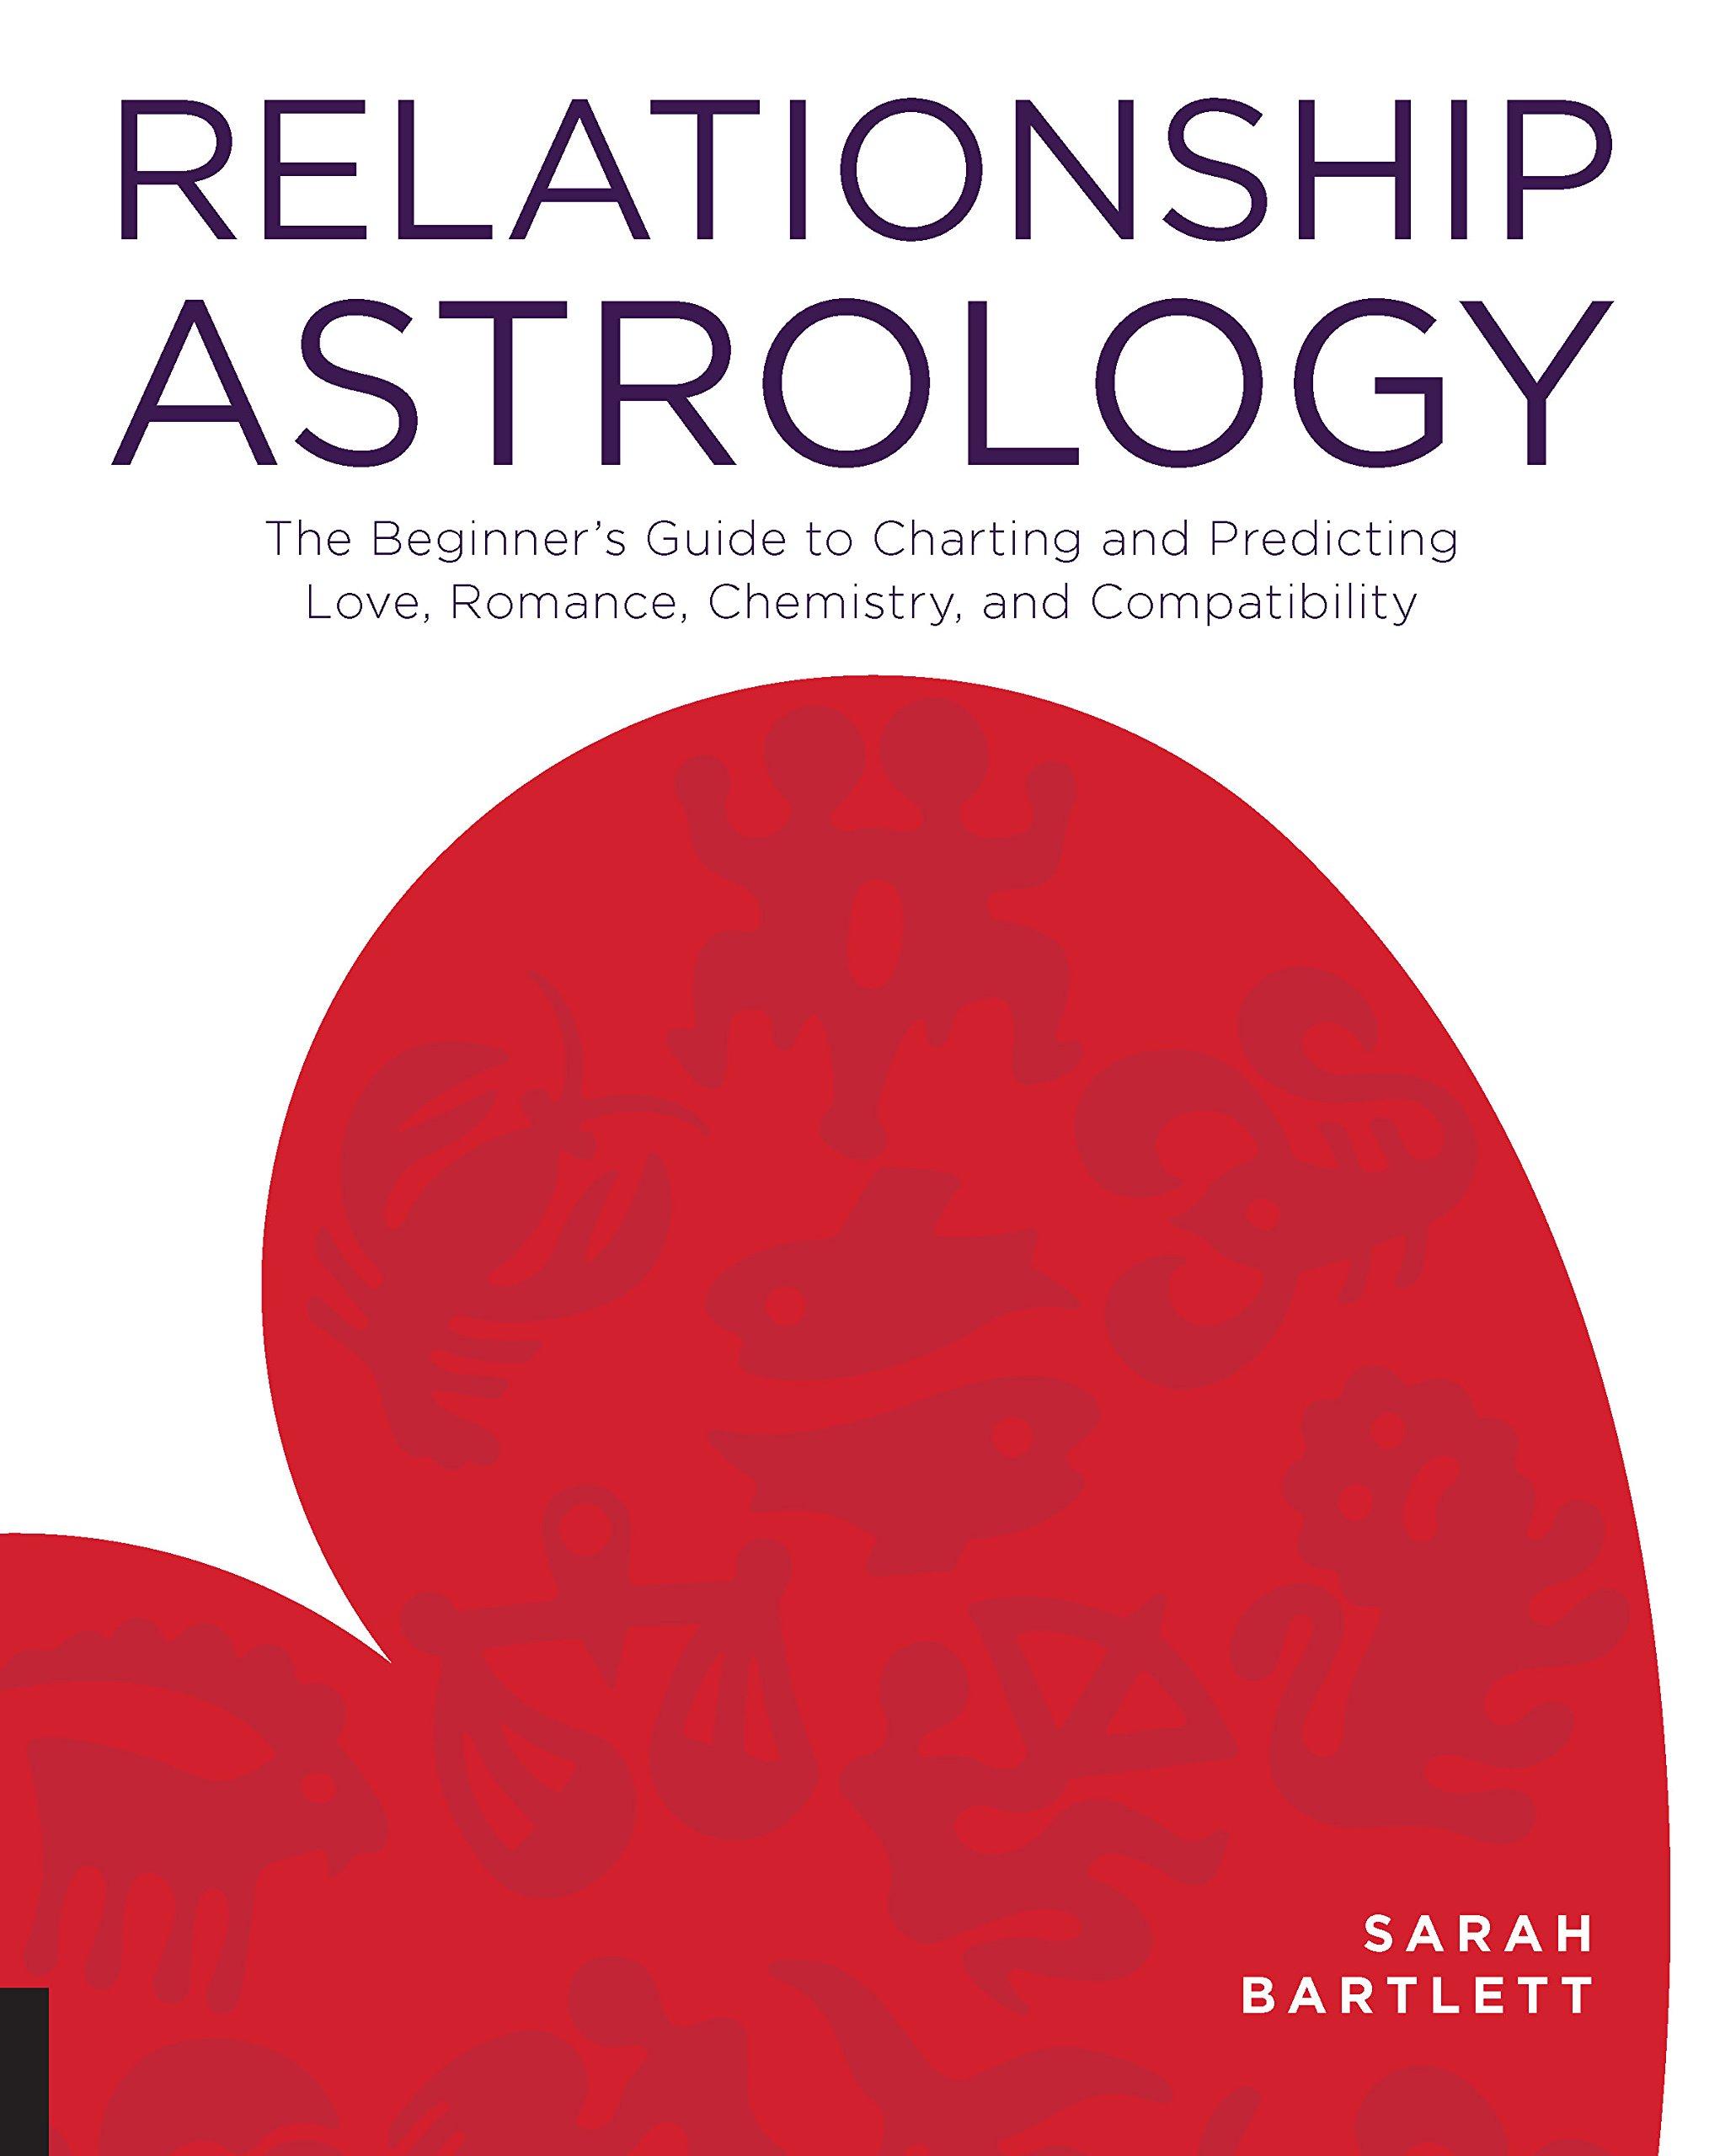 STYLECASTER | Astrology Romance Books